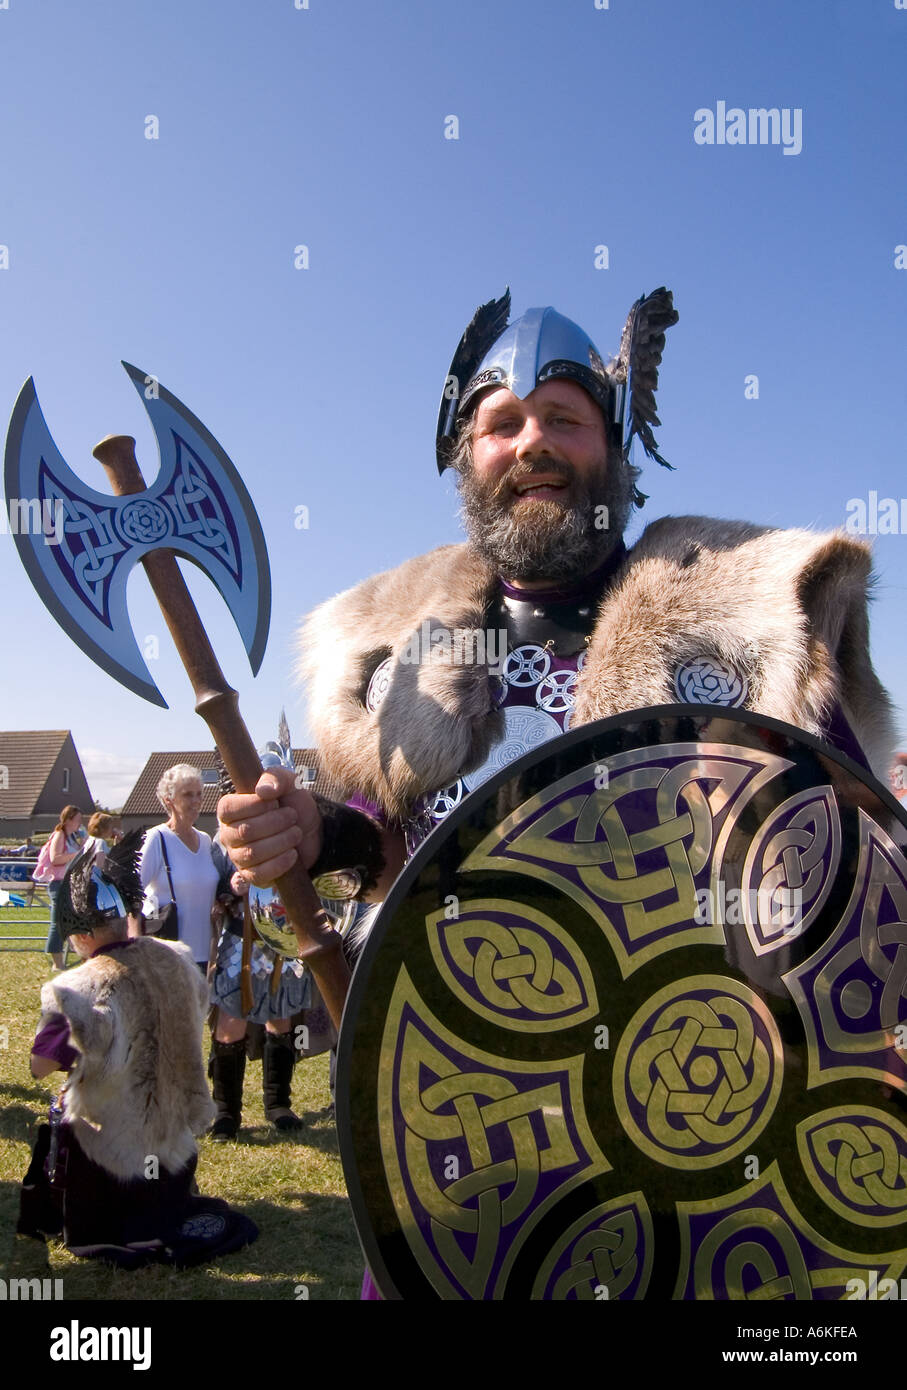 dh County Show KIRKWALL ORKNEY Shetland Jarl squad Viking dress shield helmet axe show ground Stock Photo